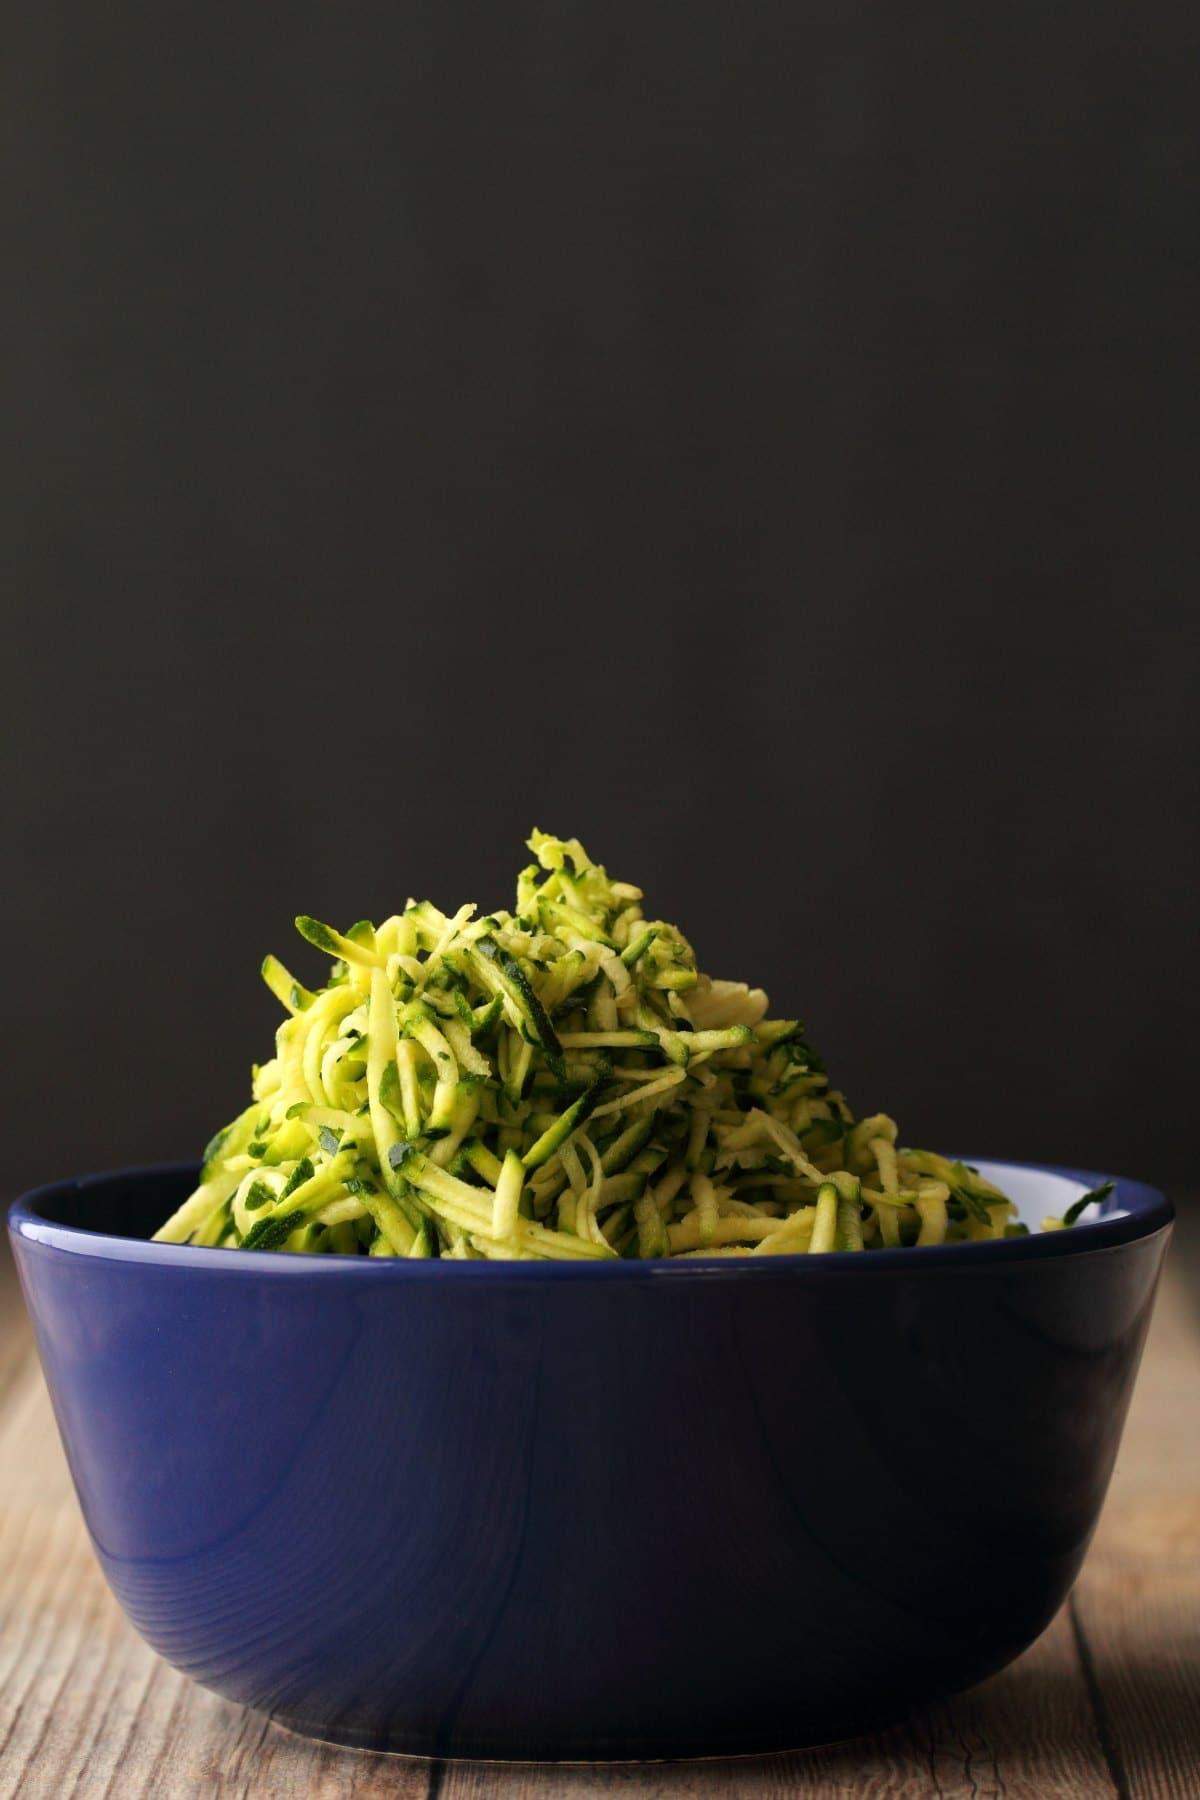 Grated zucchini in a blue bowl.